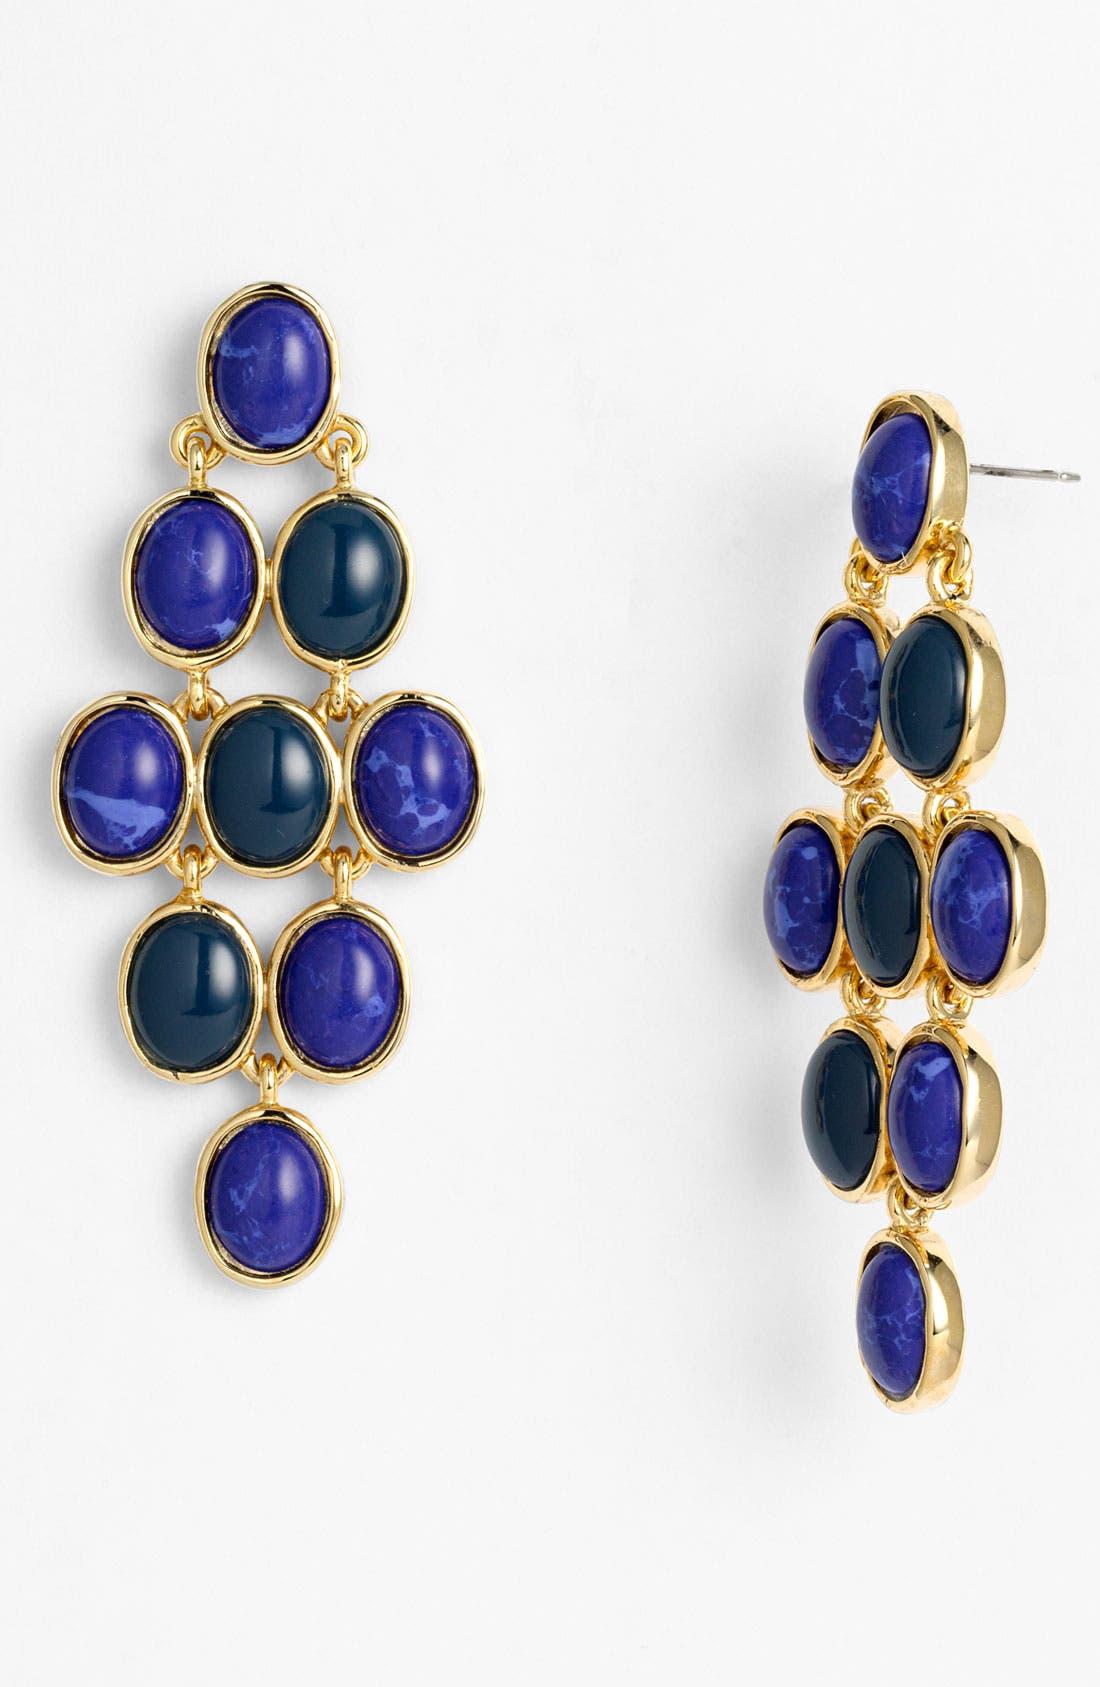 Main Image - Nordstrom 'Lapis of Luxury' Kite Earrings